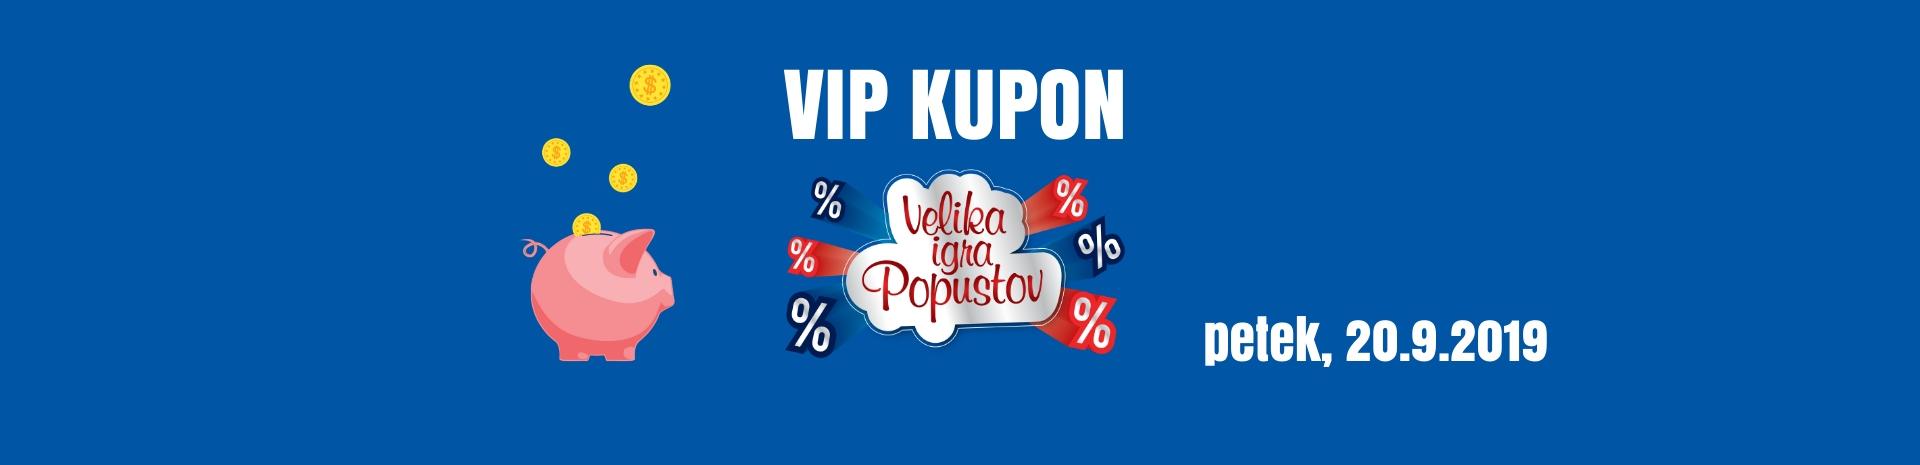 VIP KUPON INPOS 20 09 2019